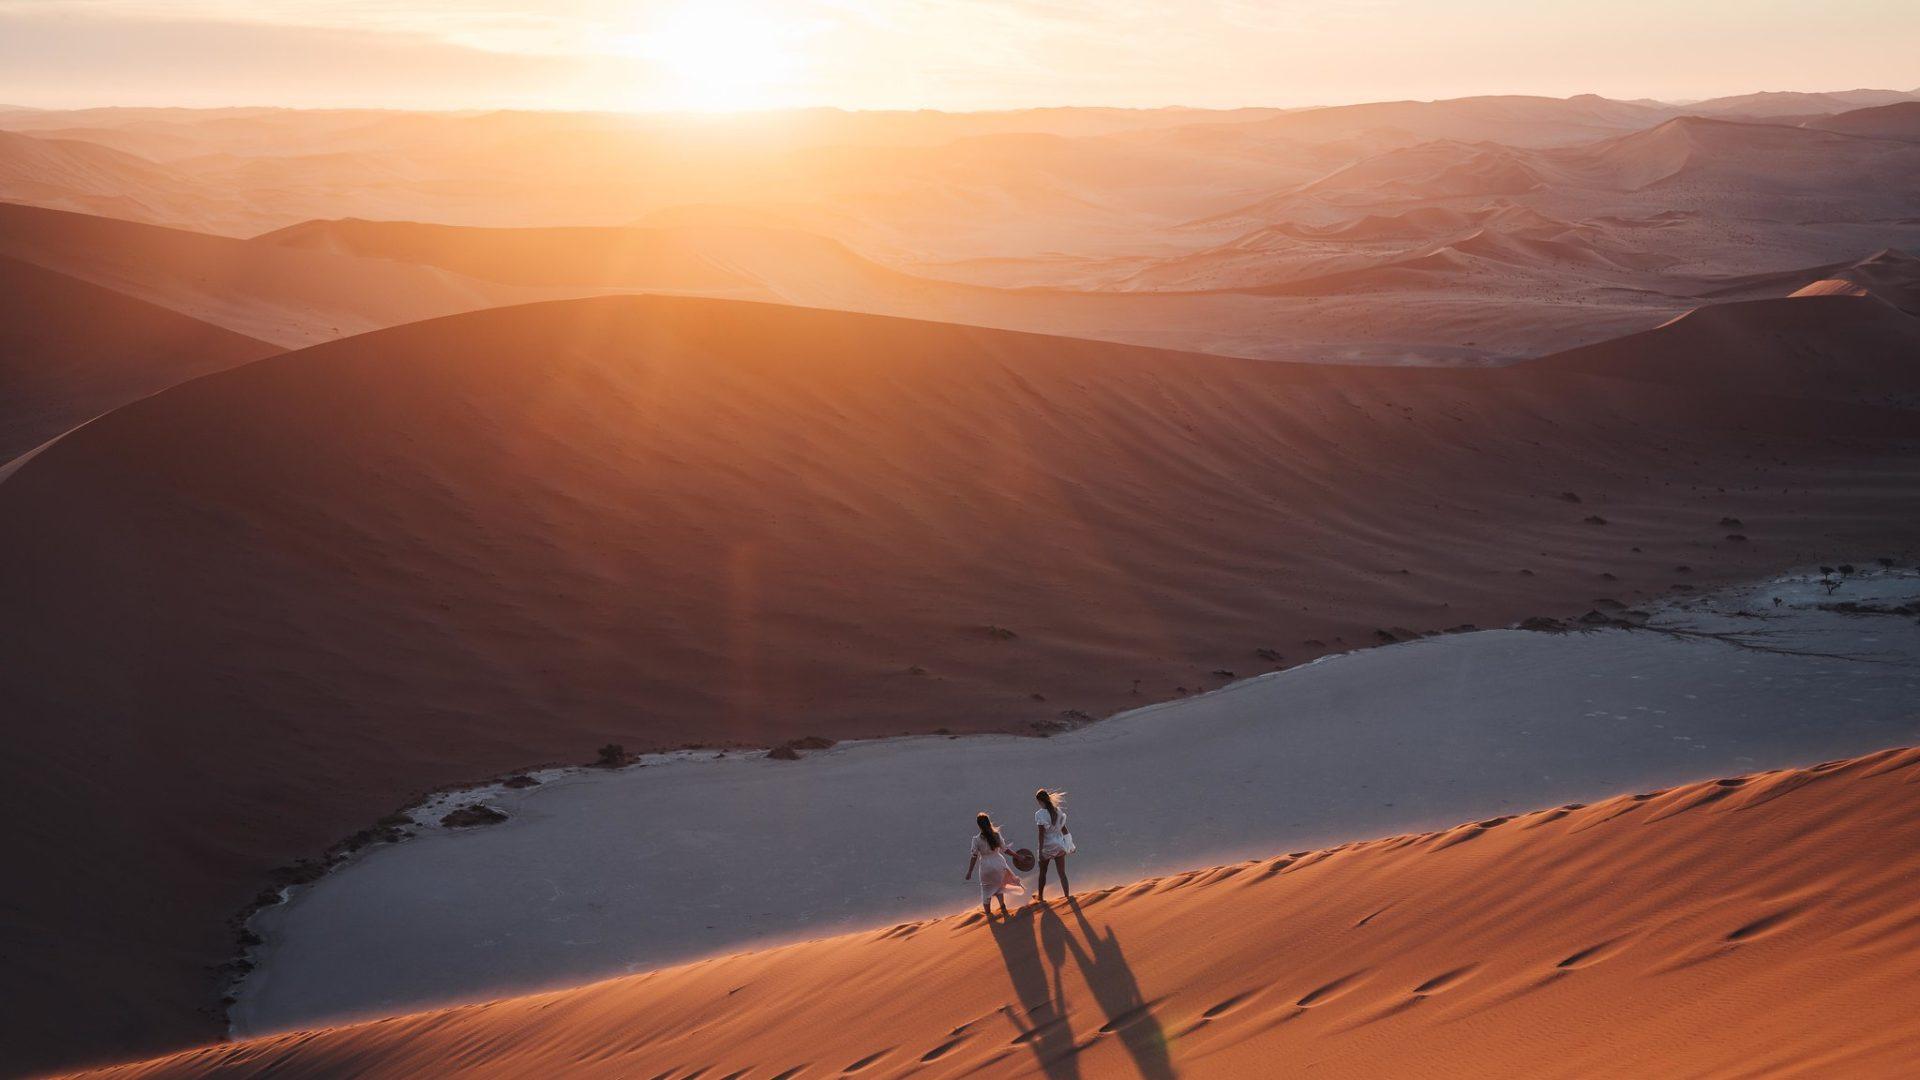 Southern Namibia landscape photography jason and emilie tour